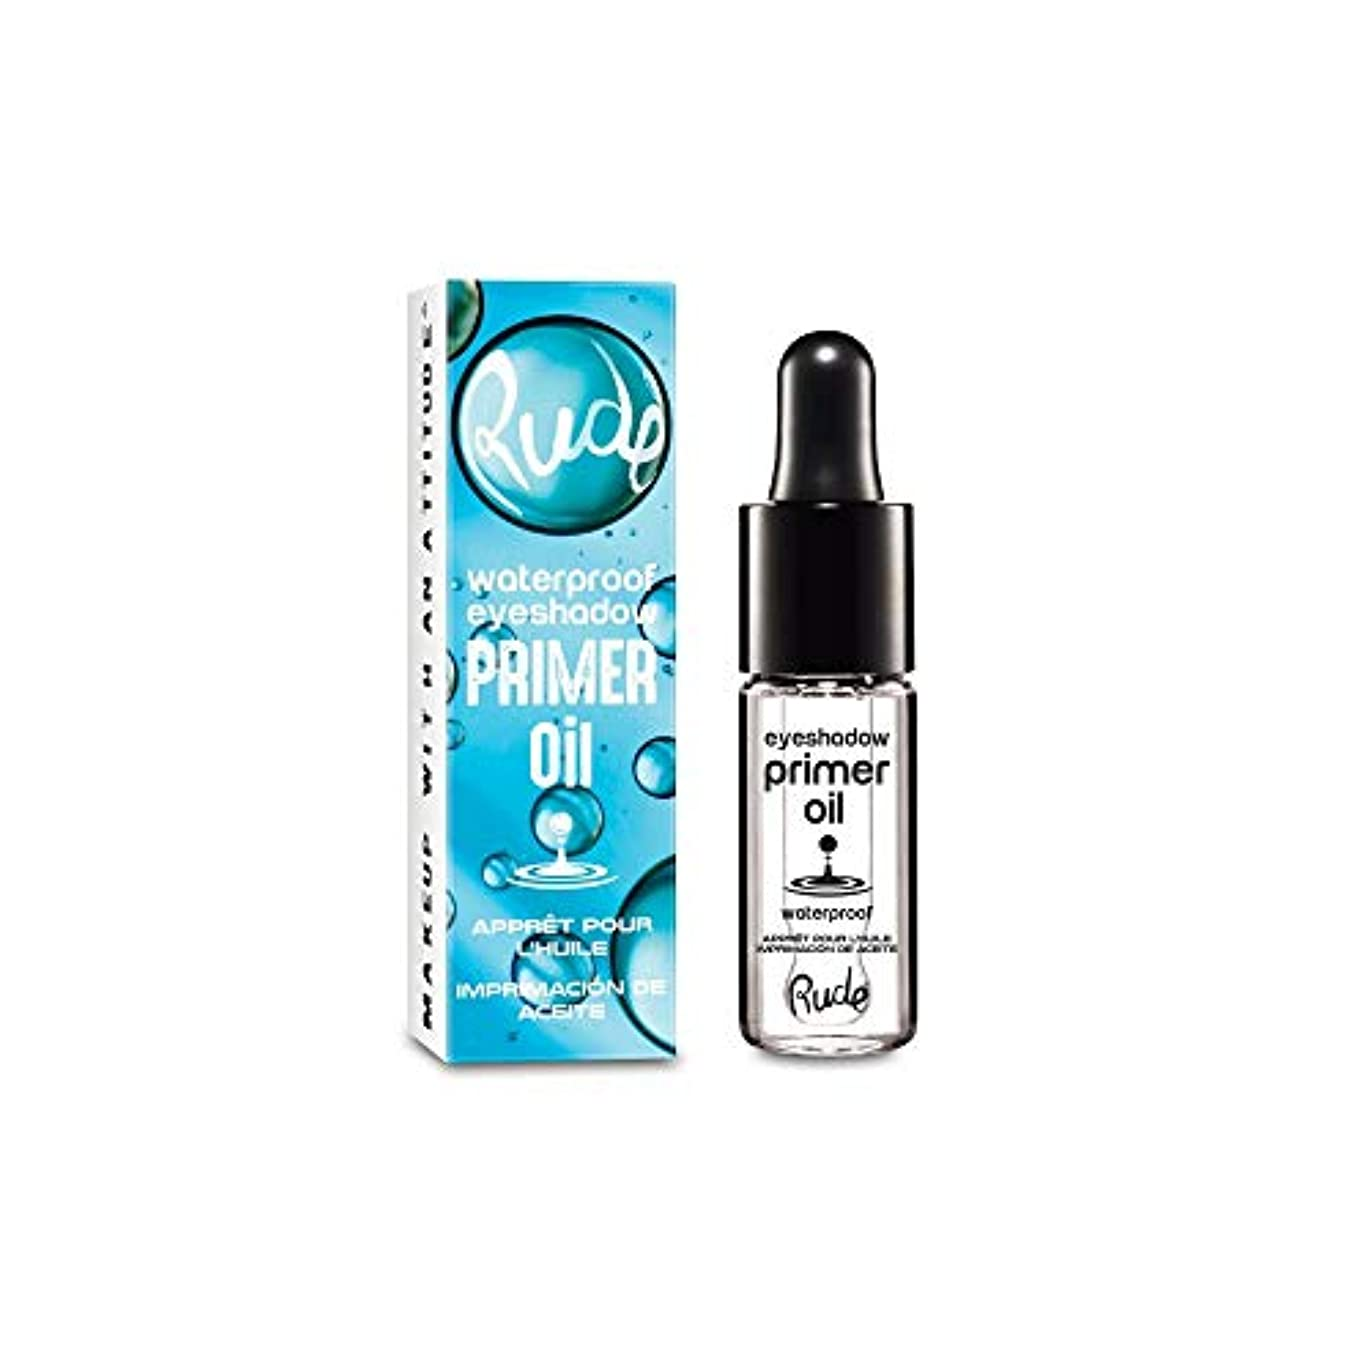 耐久円形文明化(6 Pack) RUDE Waterproof Eyeshadow Primer Oil (並行輸入品)